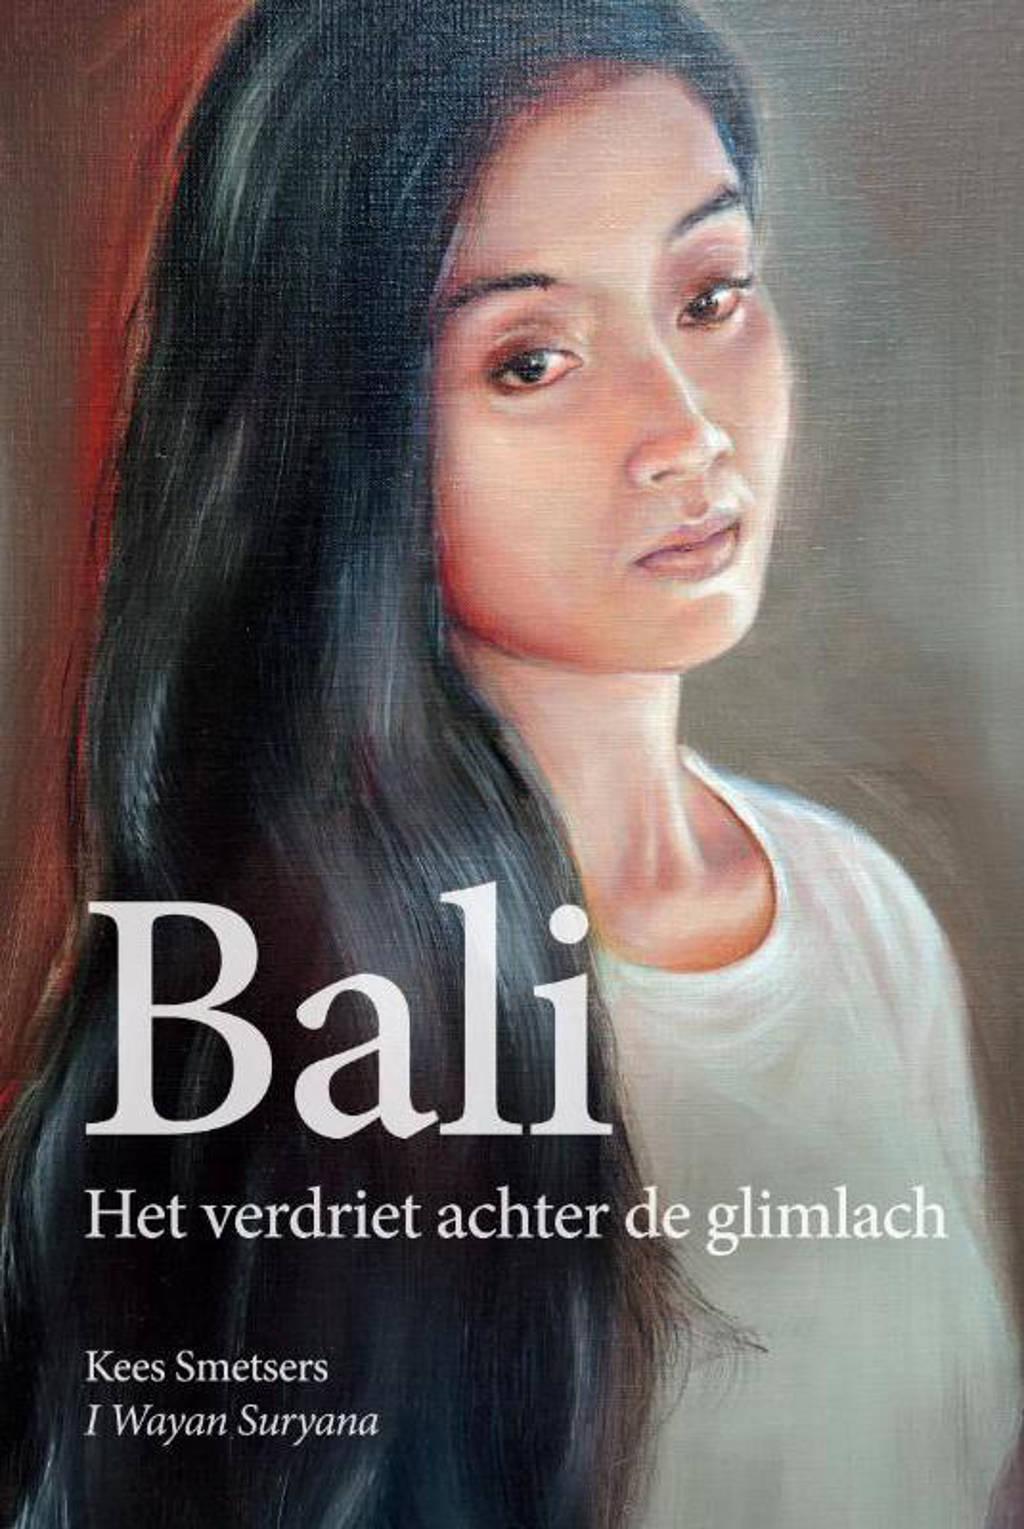 Bali, het verdriet achter de glimlach - Kees Smetsers